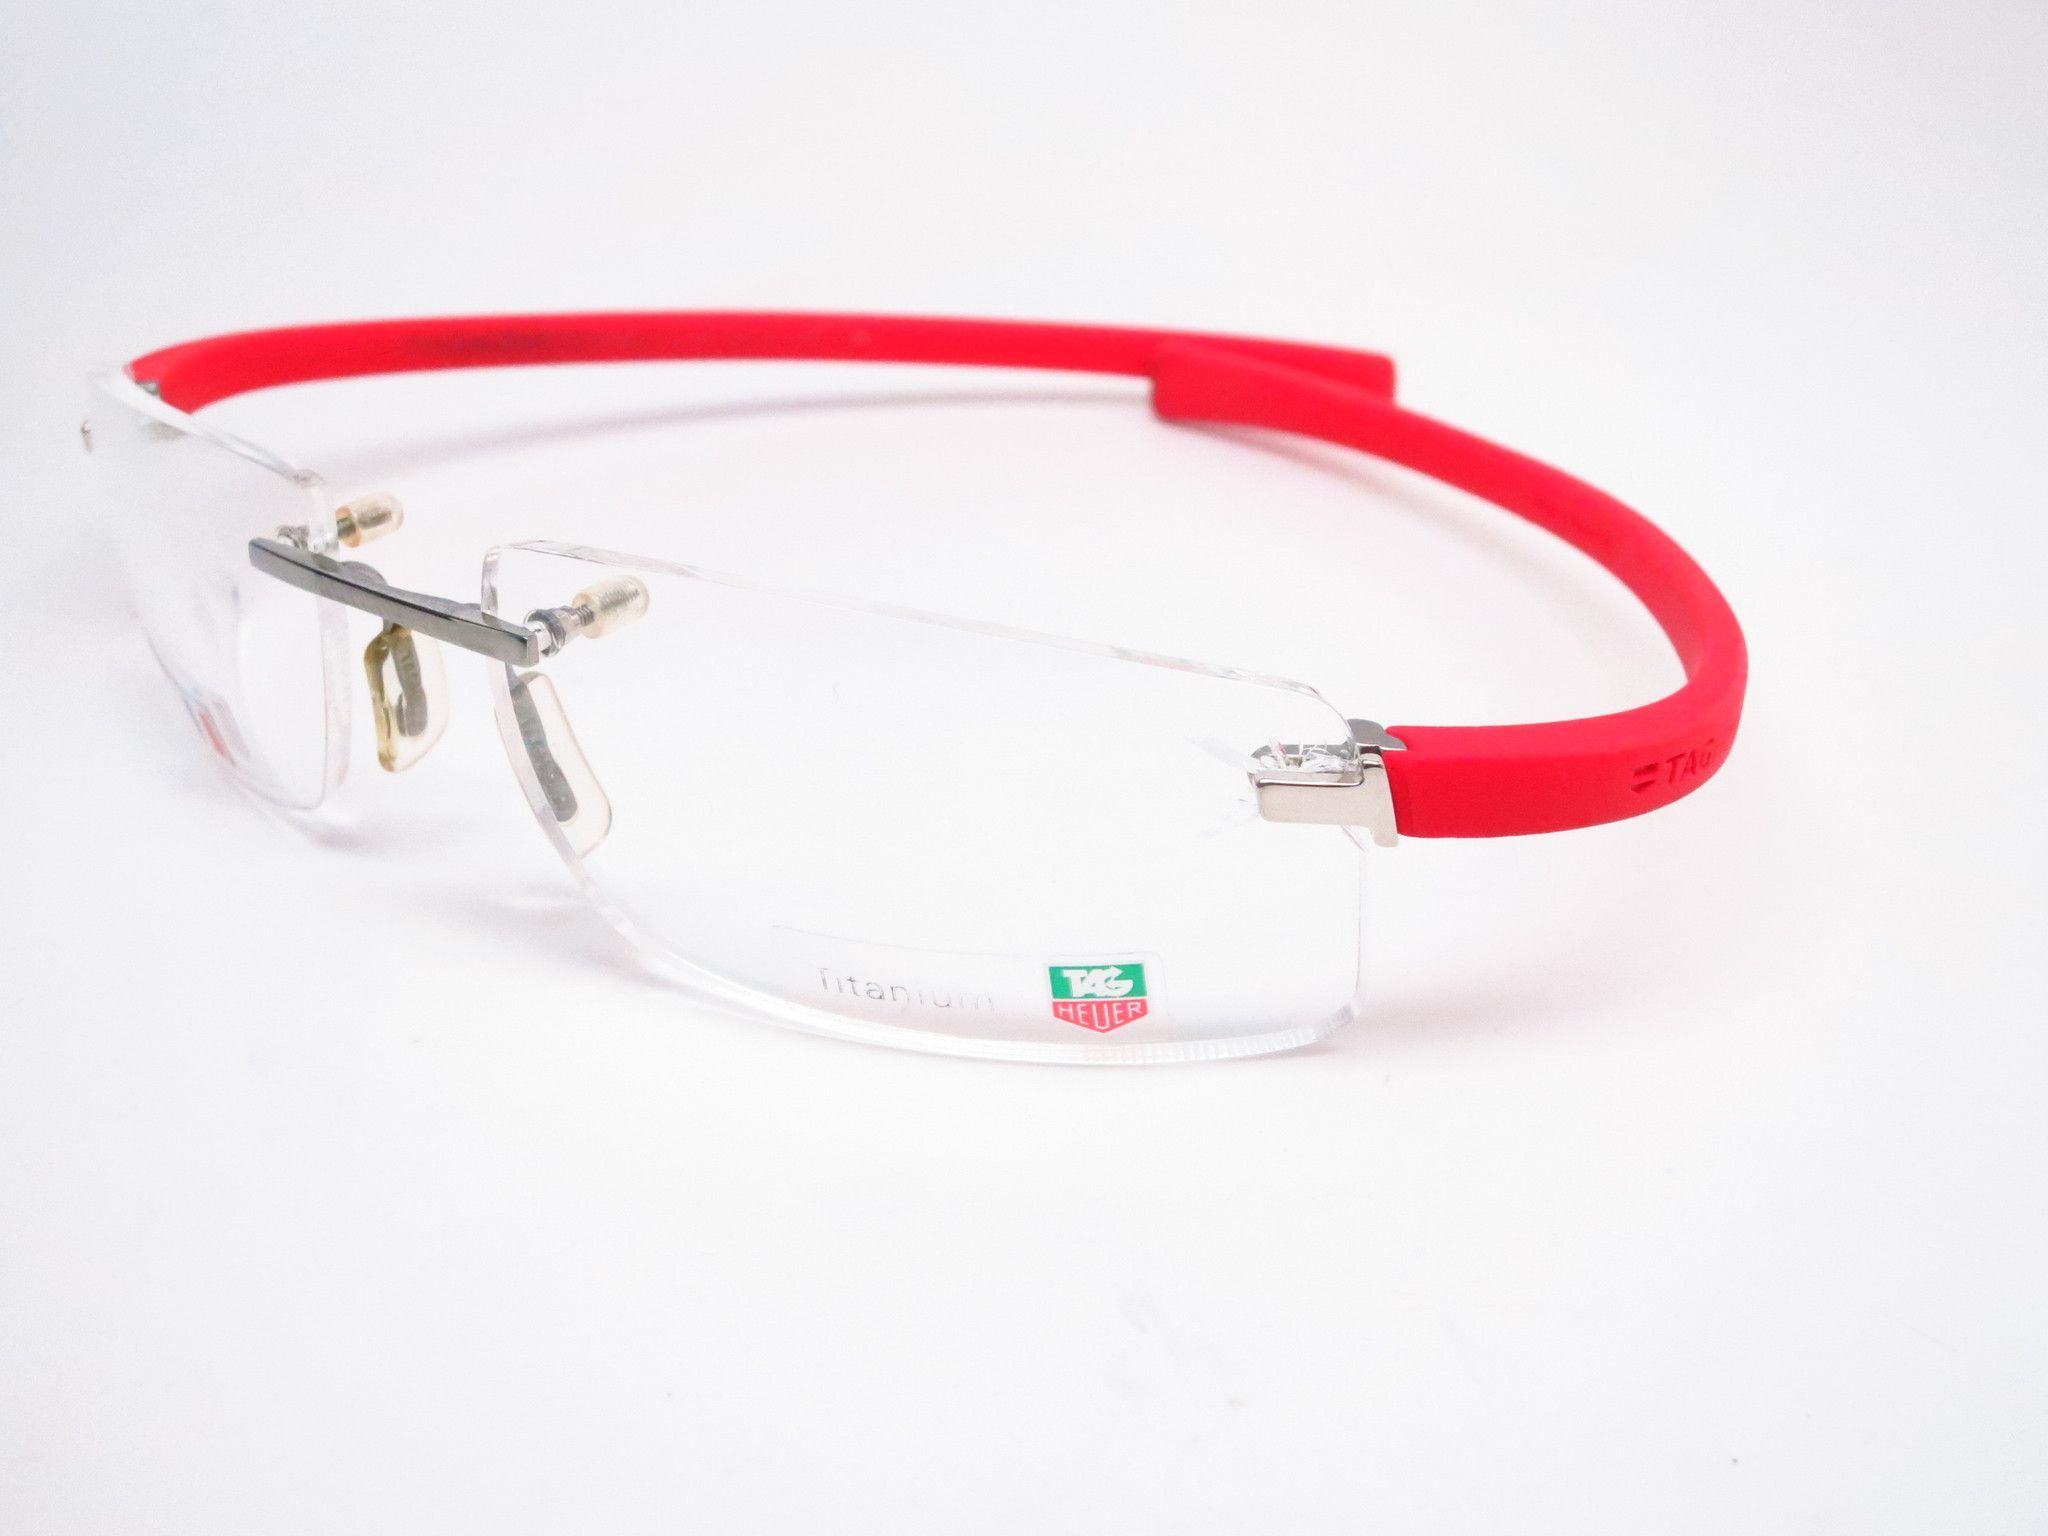 Tag heuer eyeglasses frames uk - Tag Heuer Th 3521 004 Red Rimless Eyeglasses